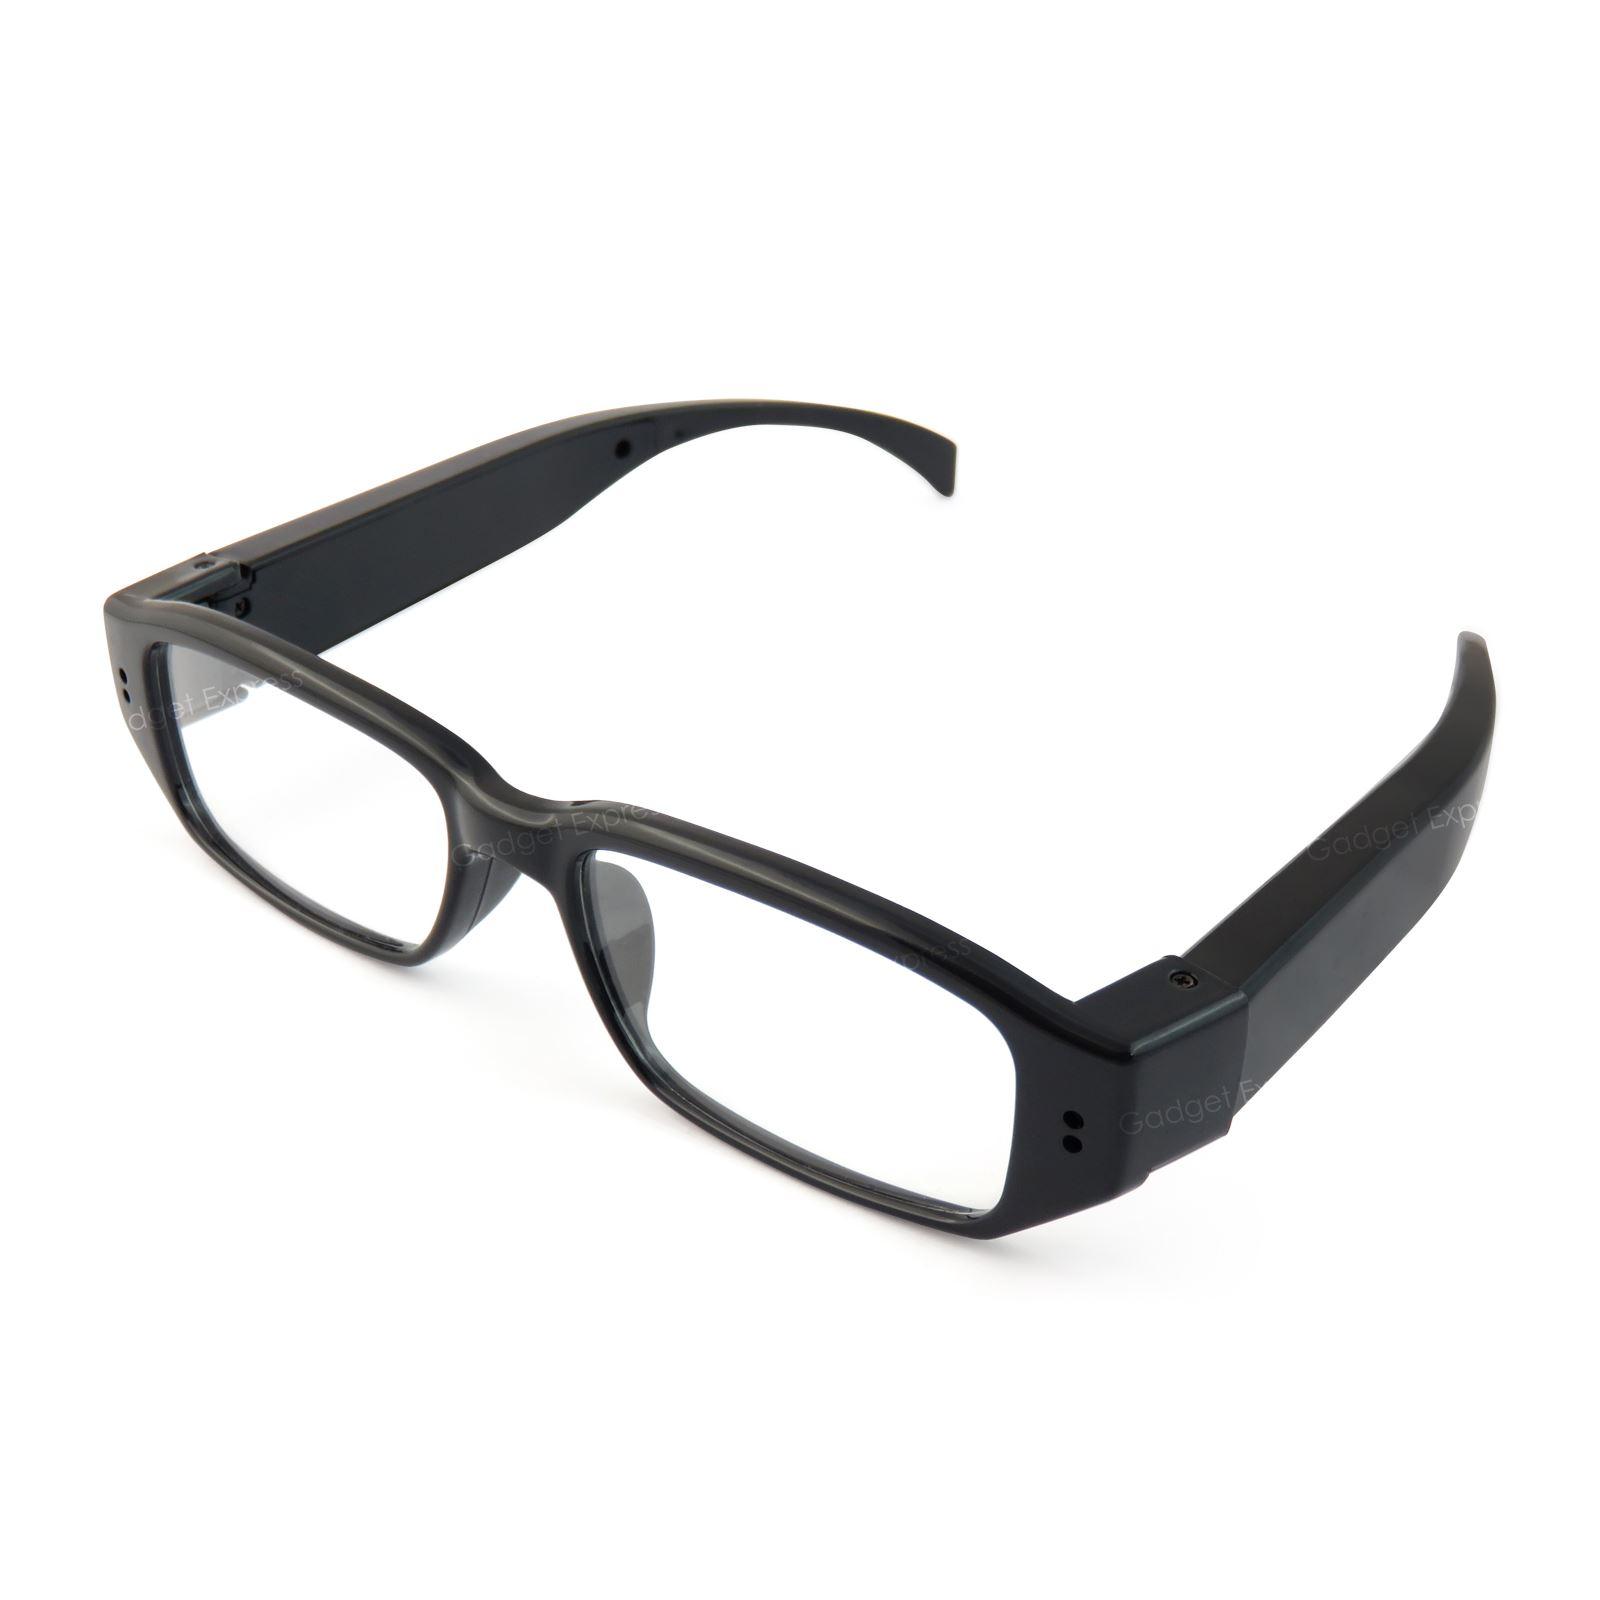 DHL freeshipping QZT Bril Verborgen Camera Onzichtbare Spy Camera DVR Video Recorder Eyewear Camera